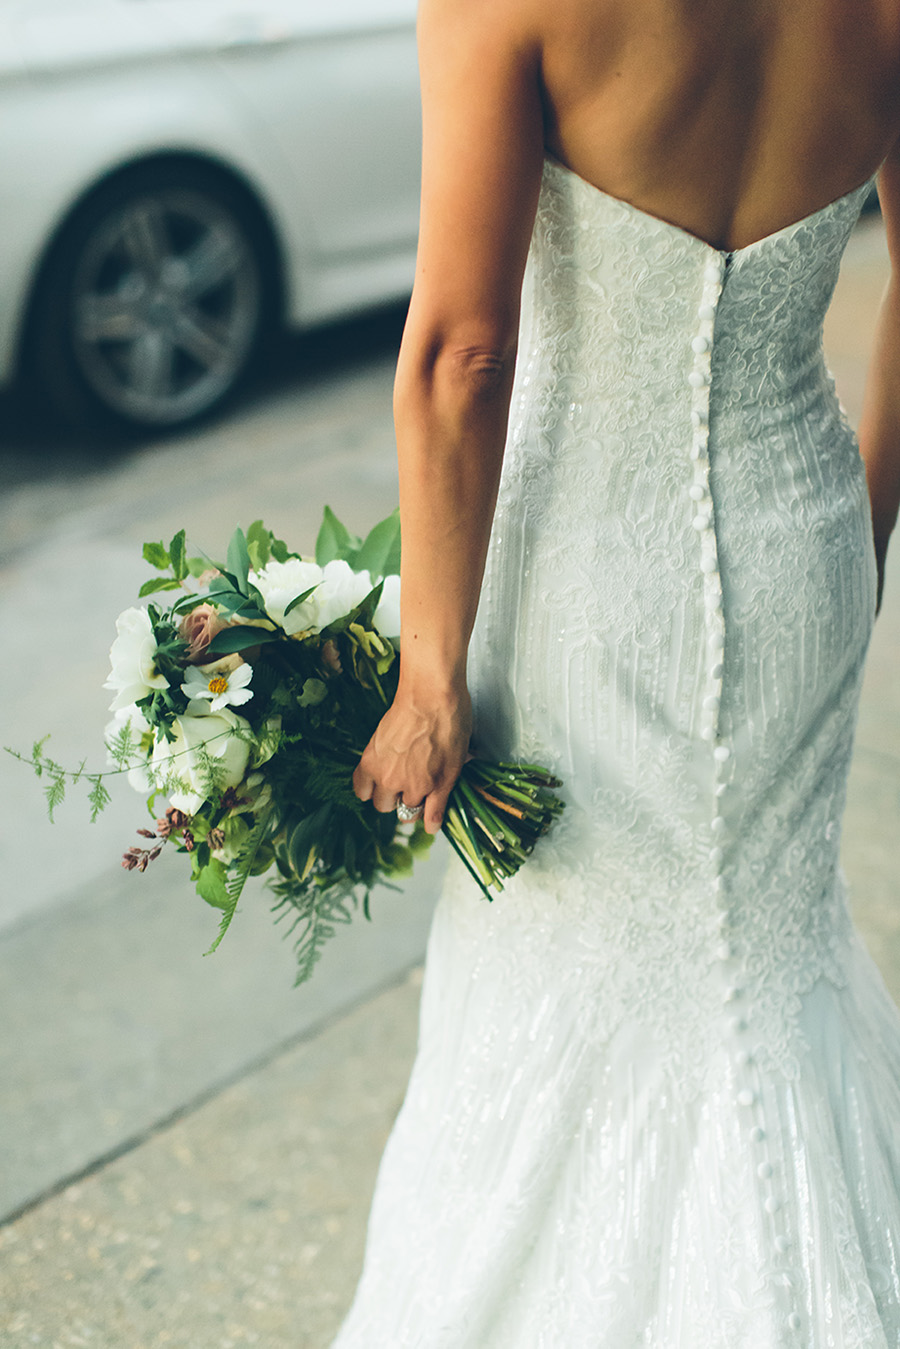 NYC-WEDDING-PHOTOGRAPHER-CITYHALL-ELOPEMENT-501-UNION-BROOKLYN-WEDDING-JILL-JUSTIN0019.jpg